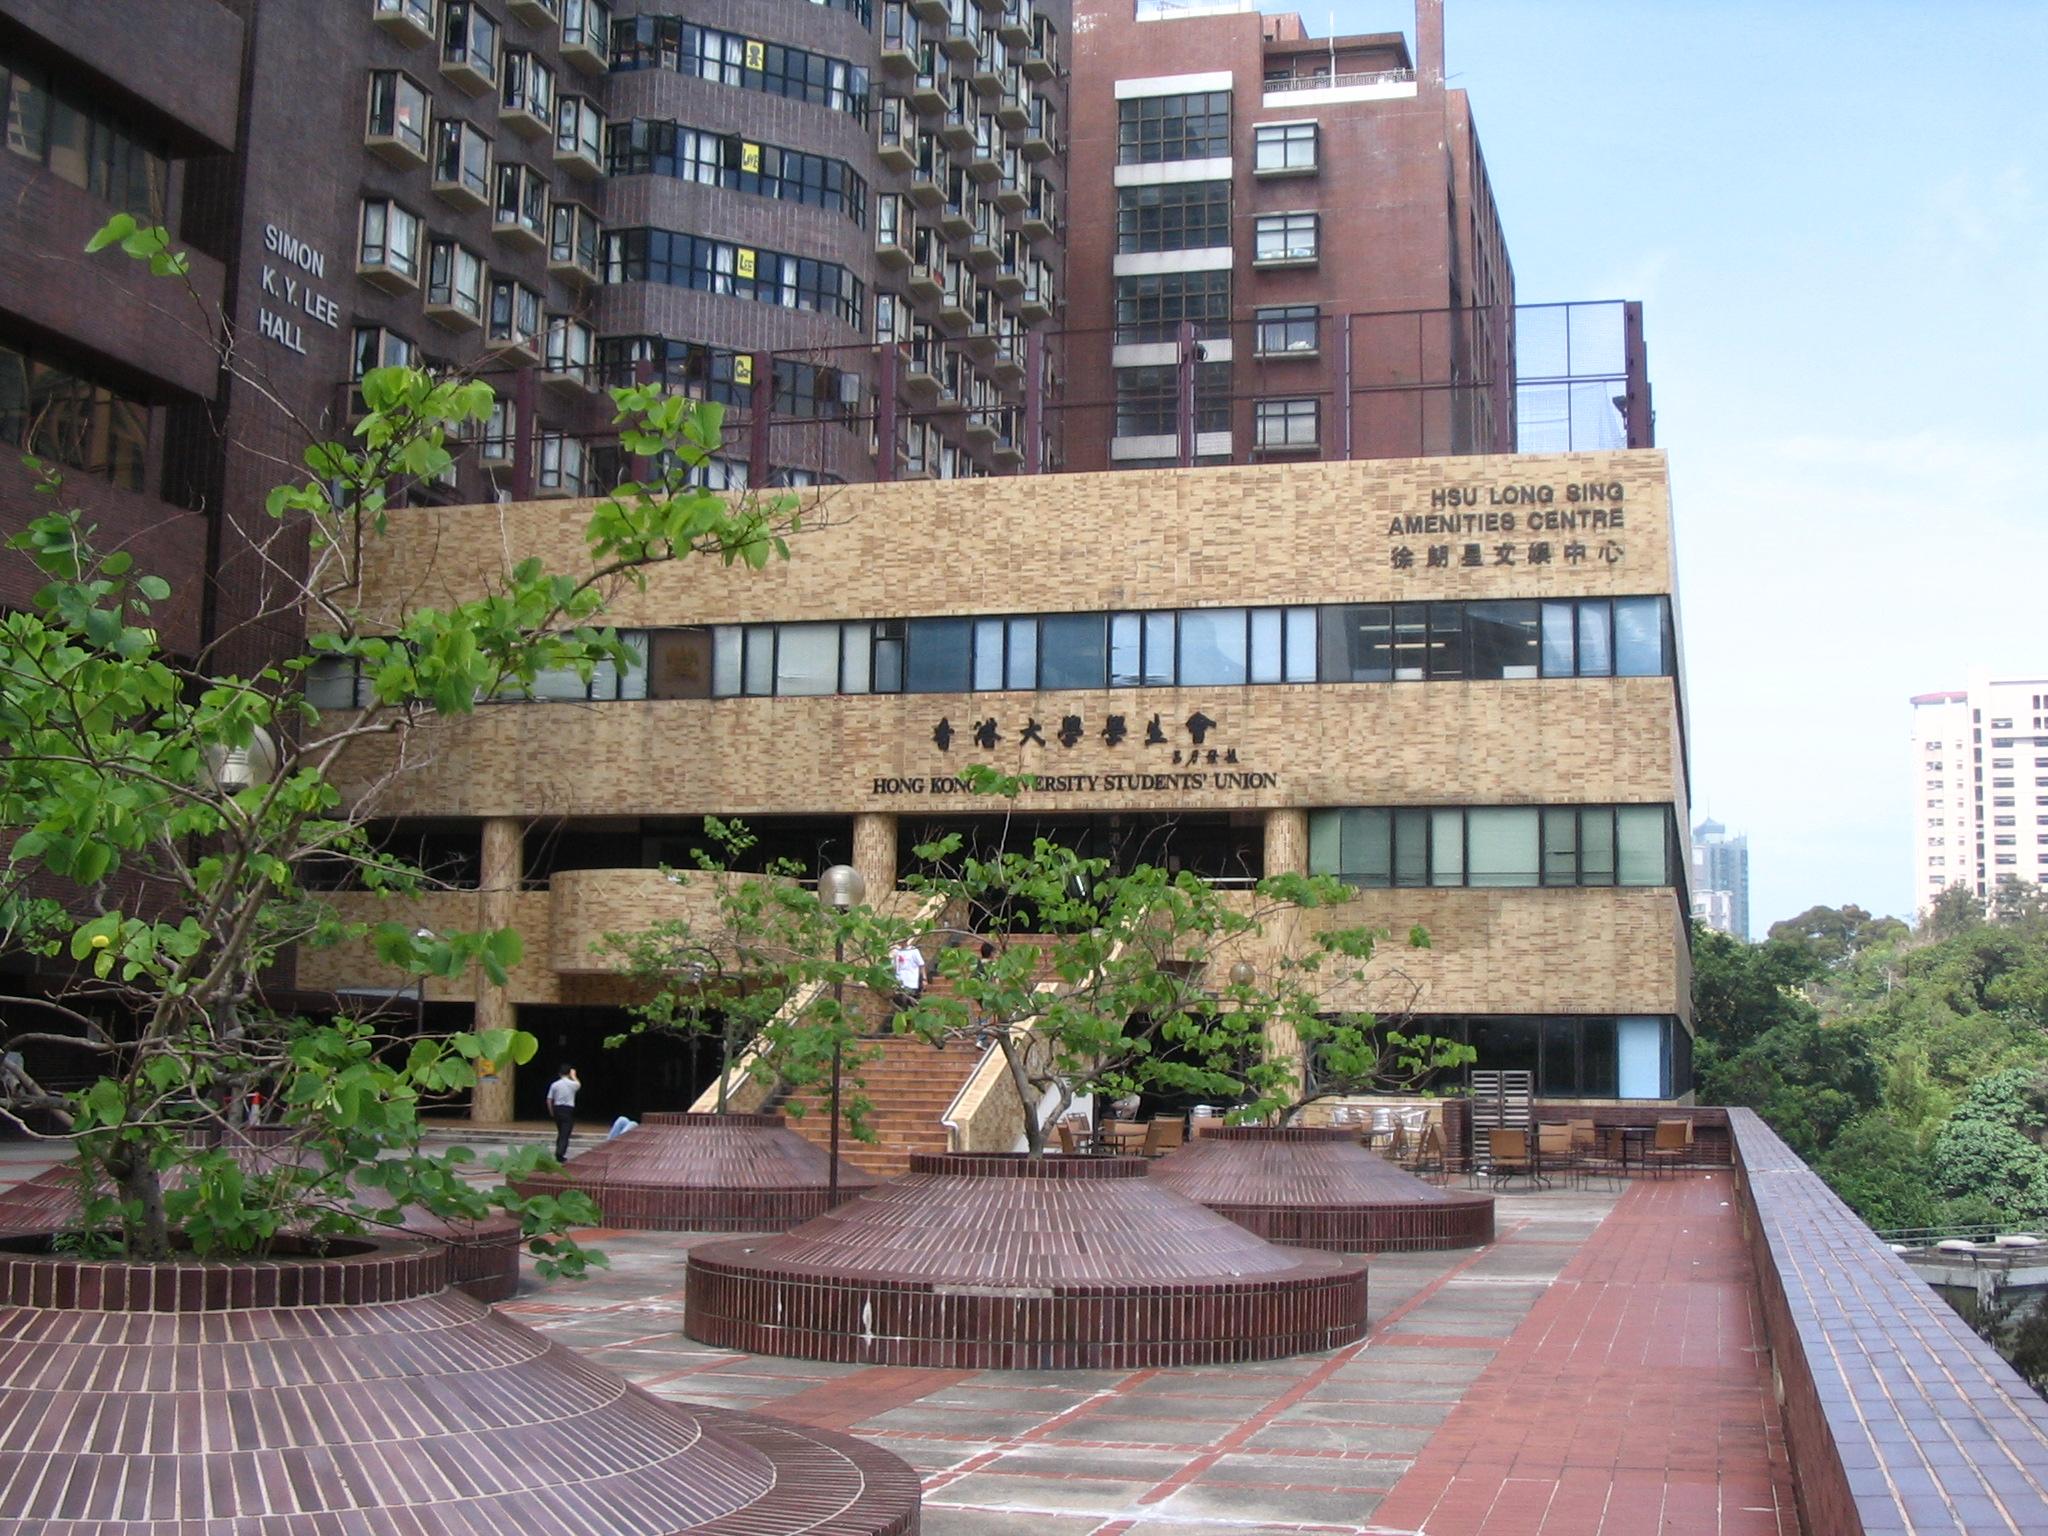 hong_kong_university_students_union_1.jpg